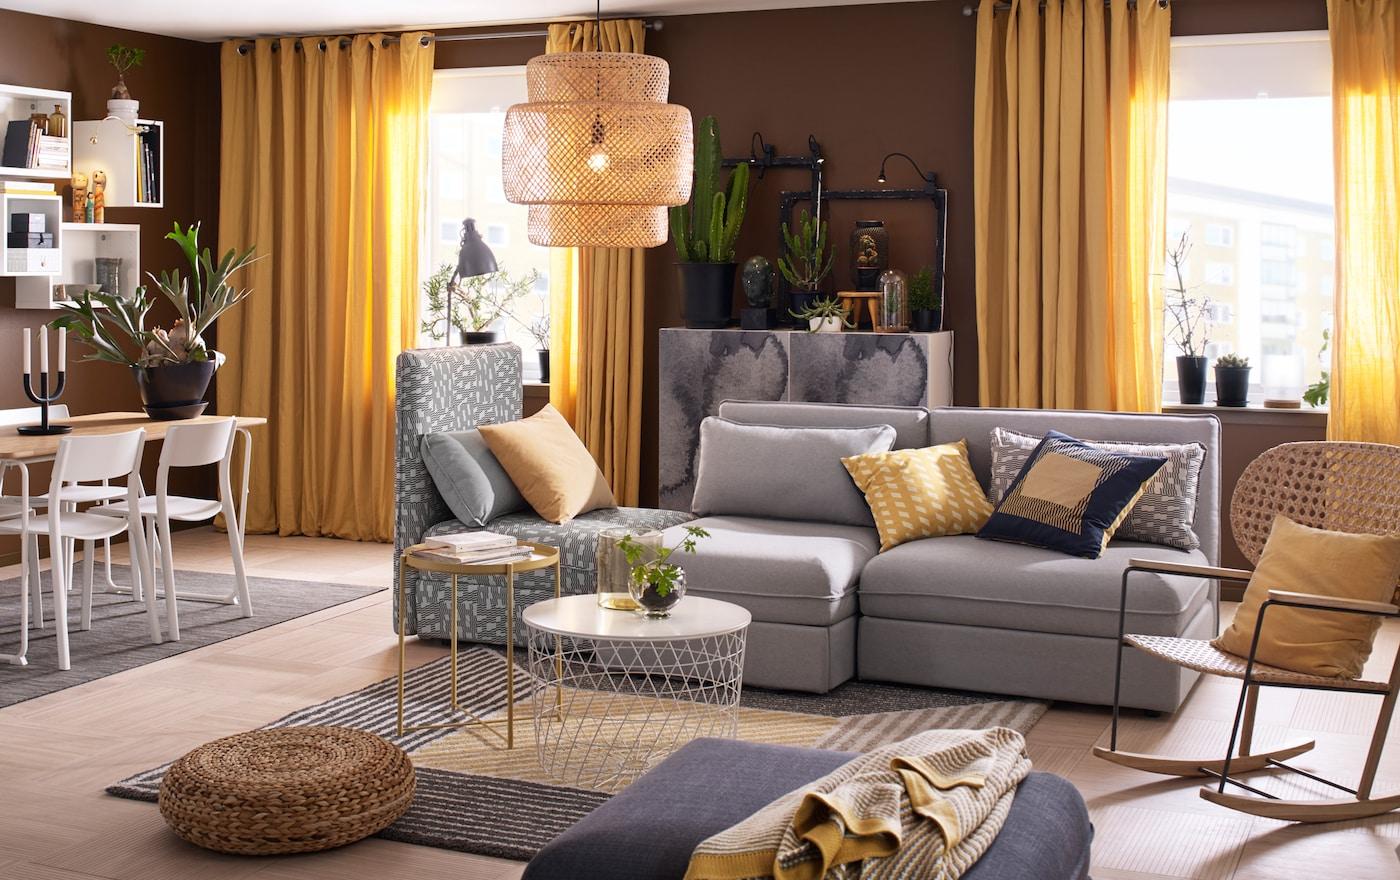 das passende sofa f r deinen lebensstil ikea ikea. Black Bedroom Furniture Sets. Home Design Ideas